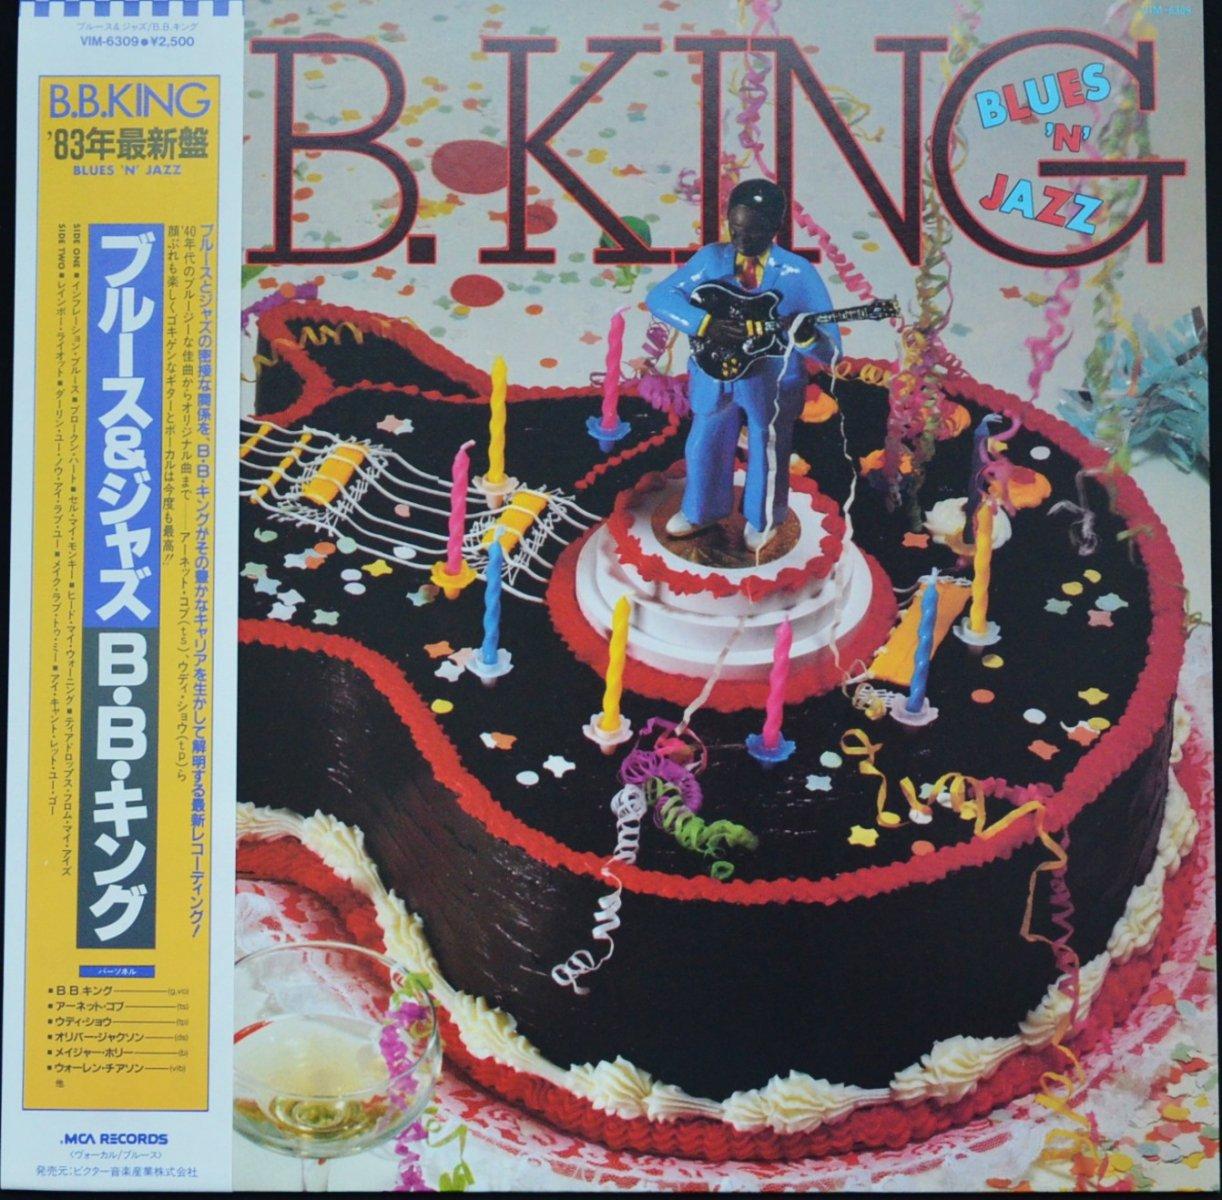 B.B.キング B.B. KING / ブルース & ジャズ BLUES 'N' JAZZ (LP)